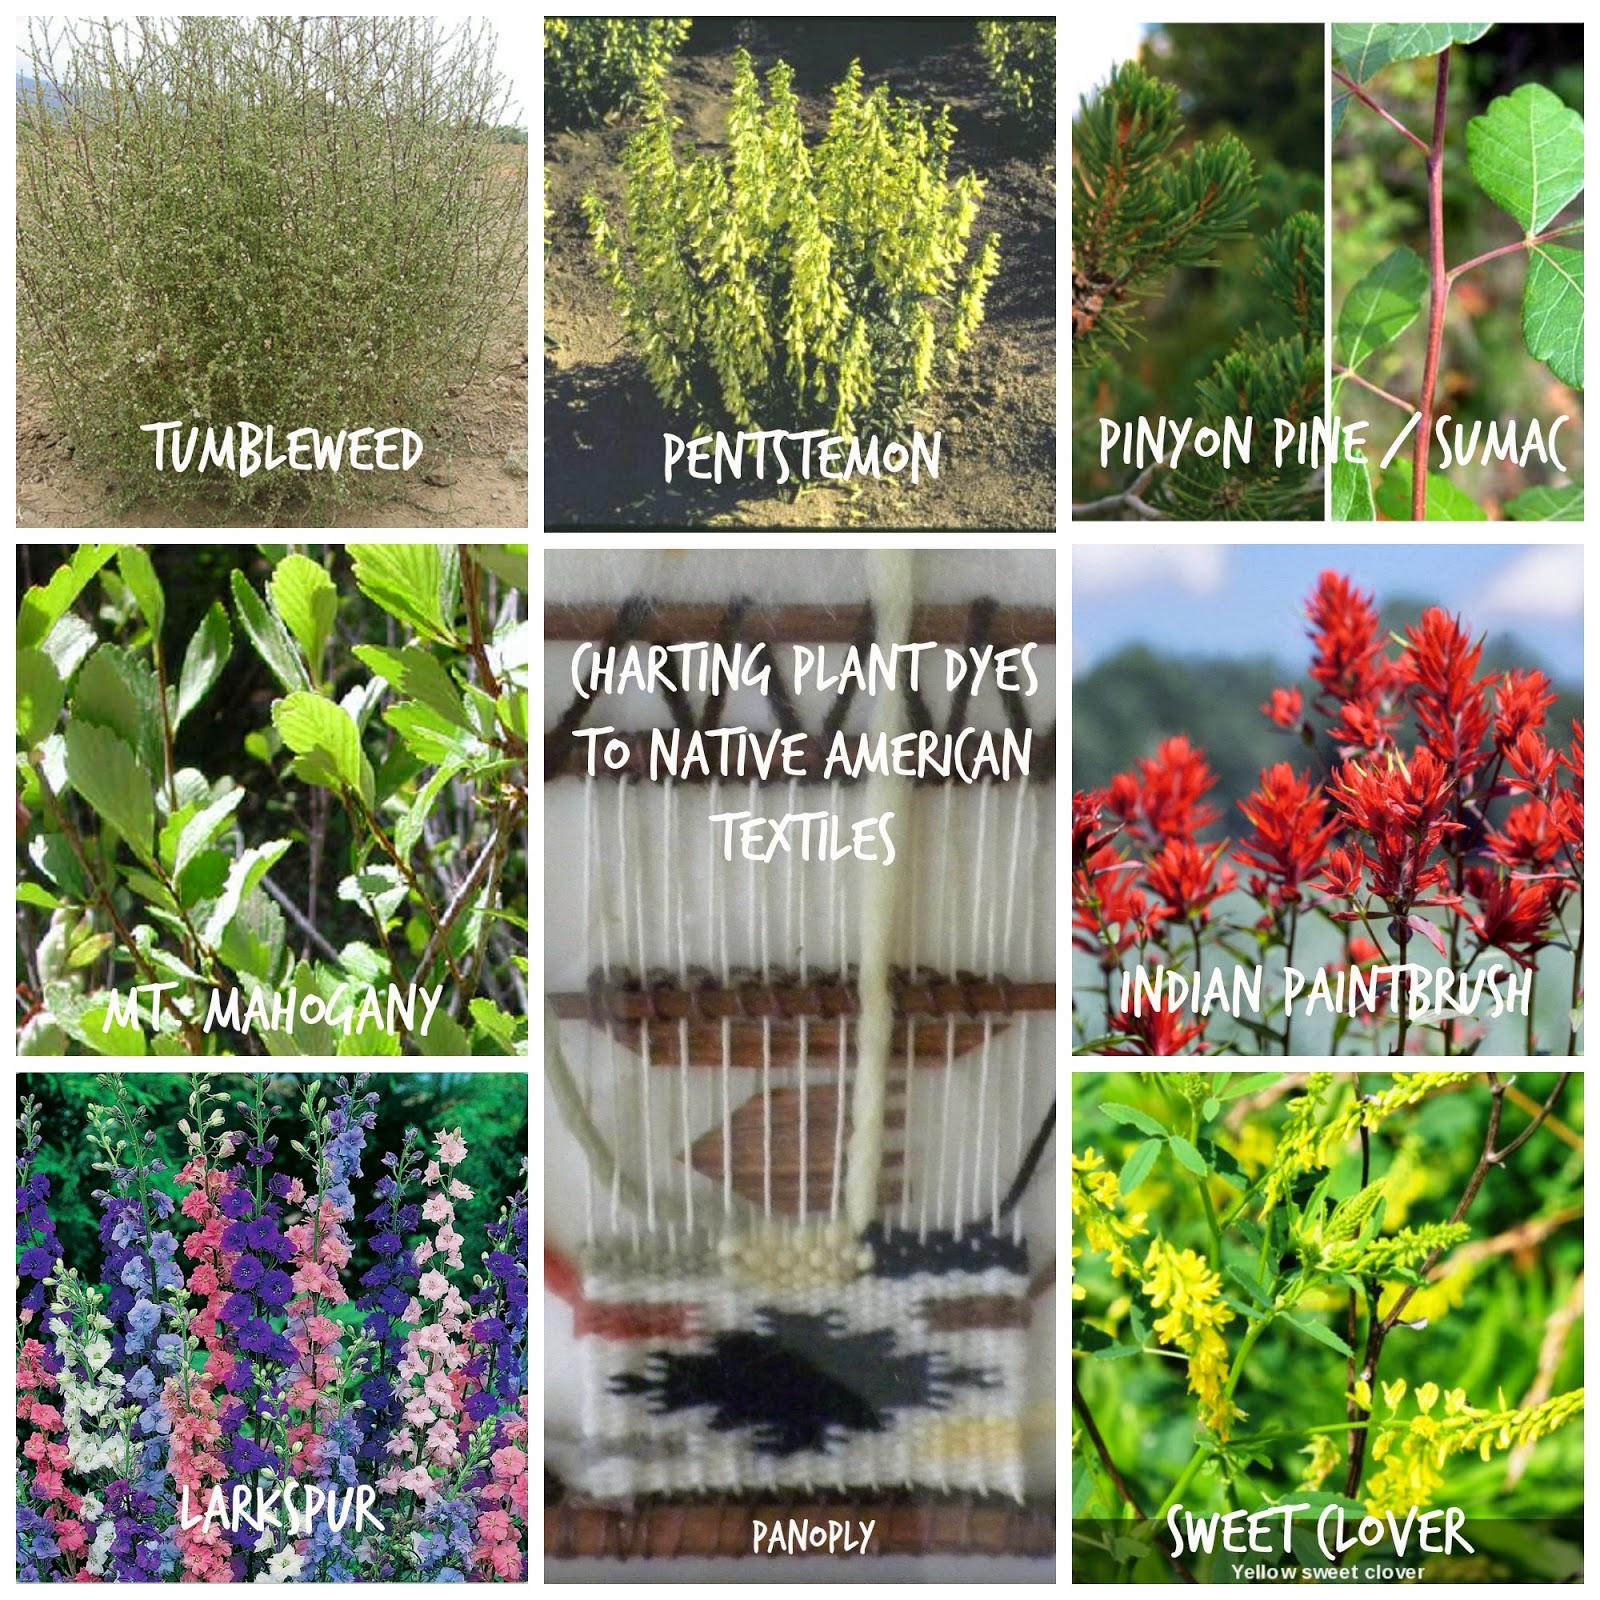 USDA: Natural Plant Dyes